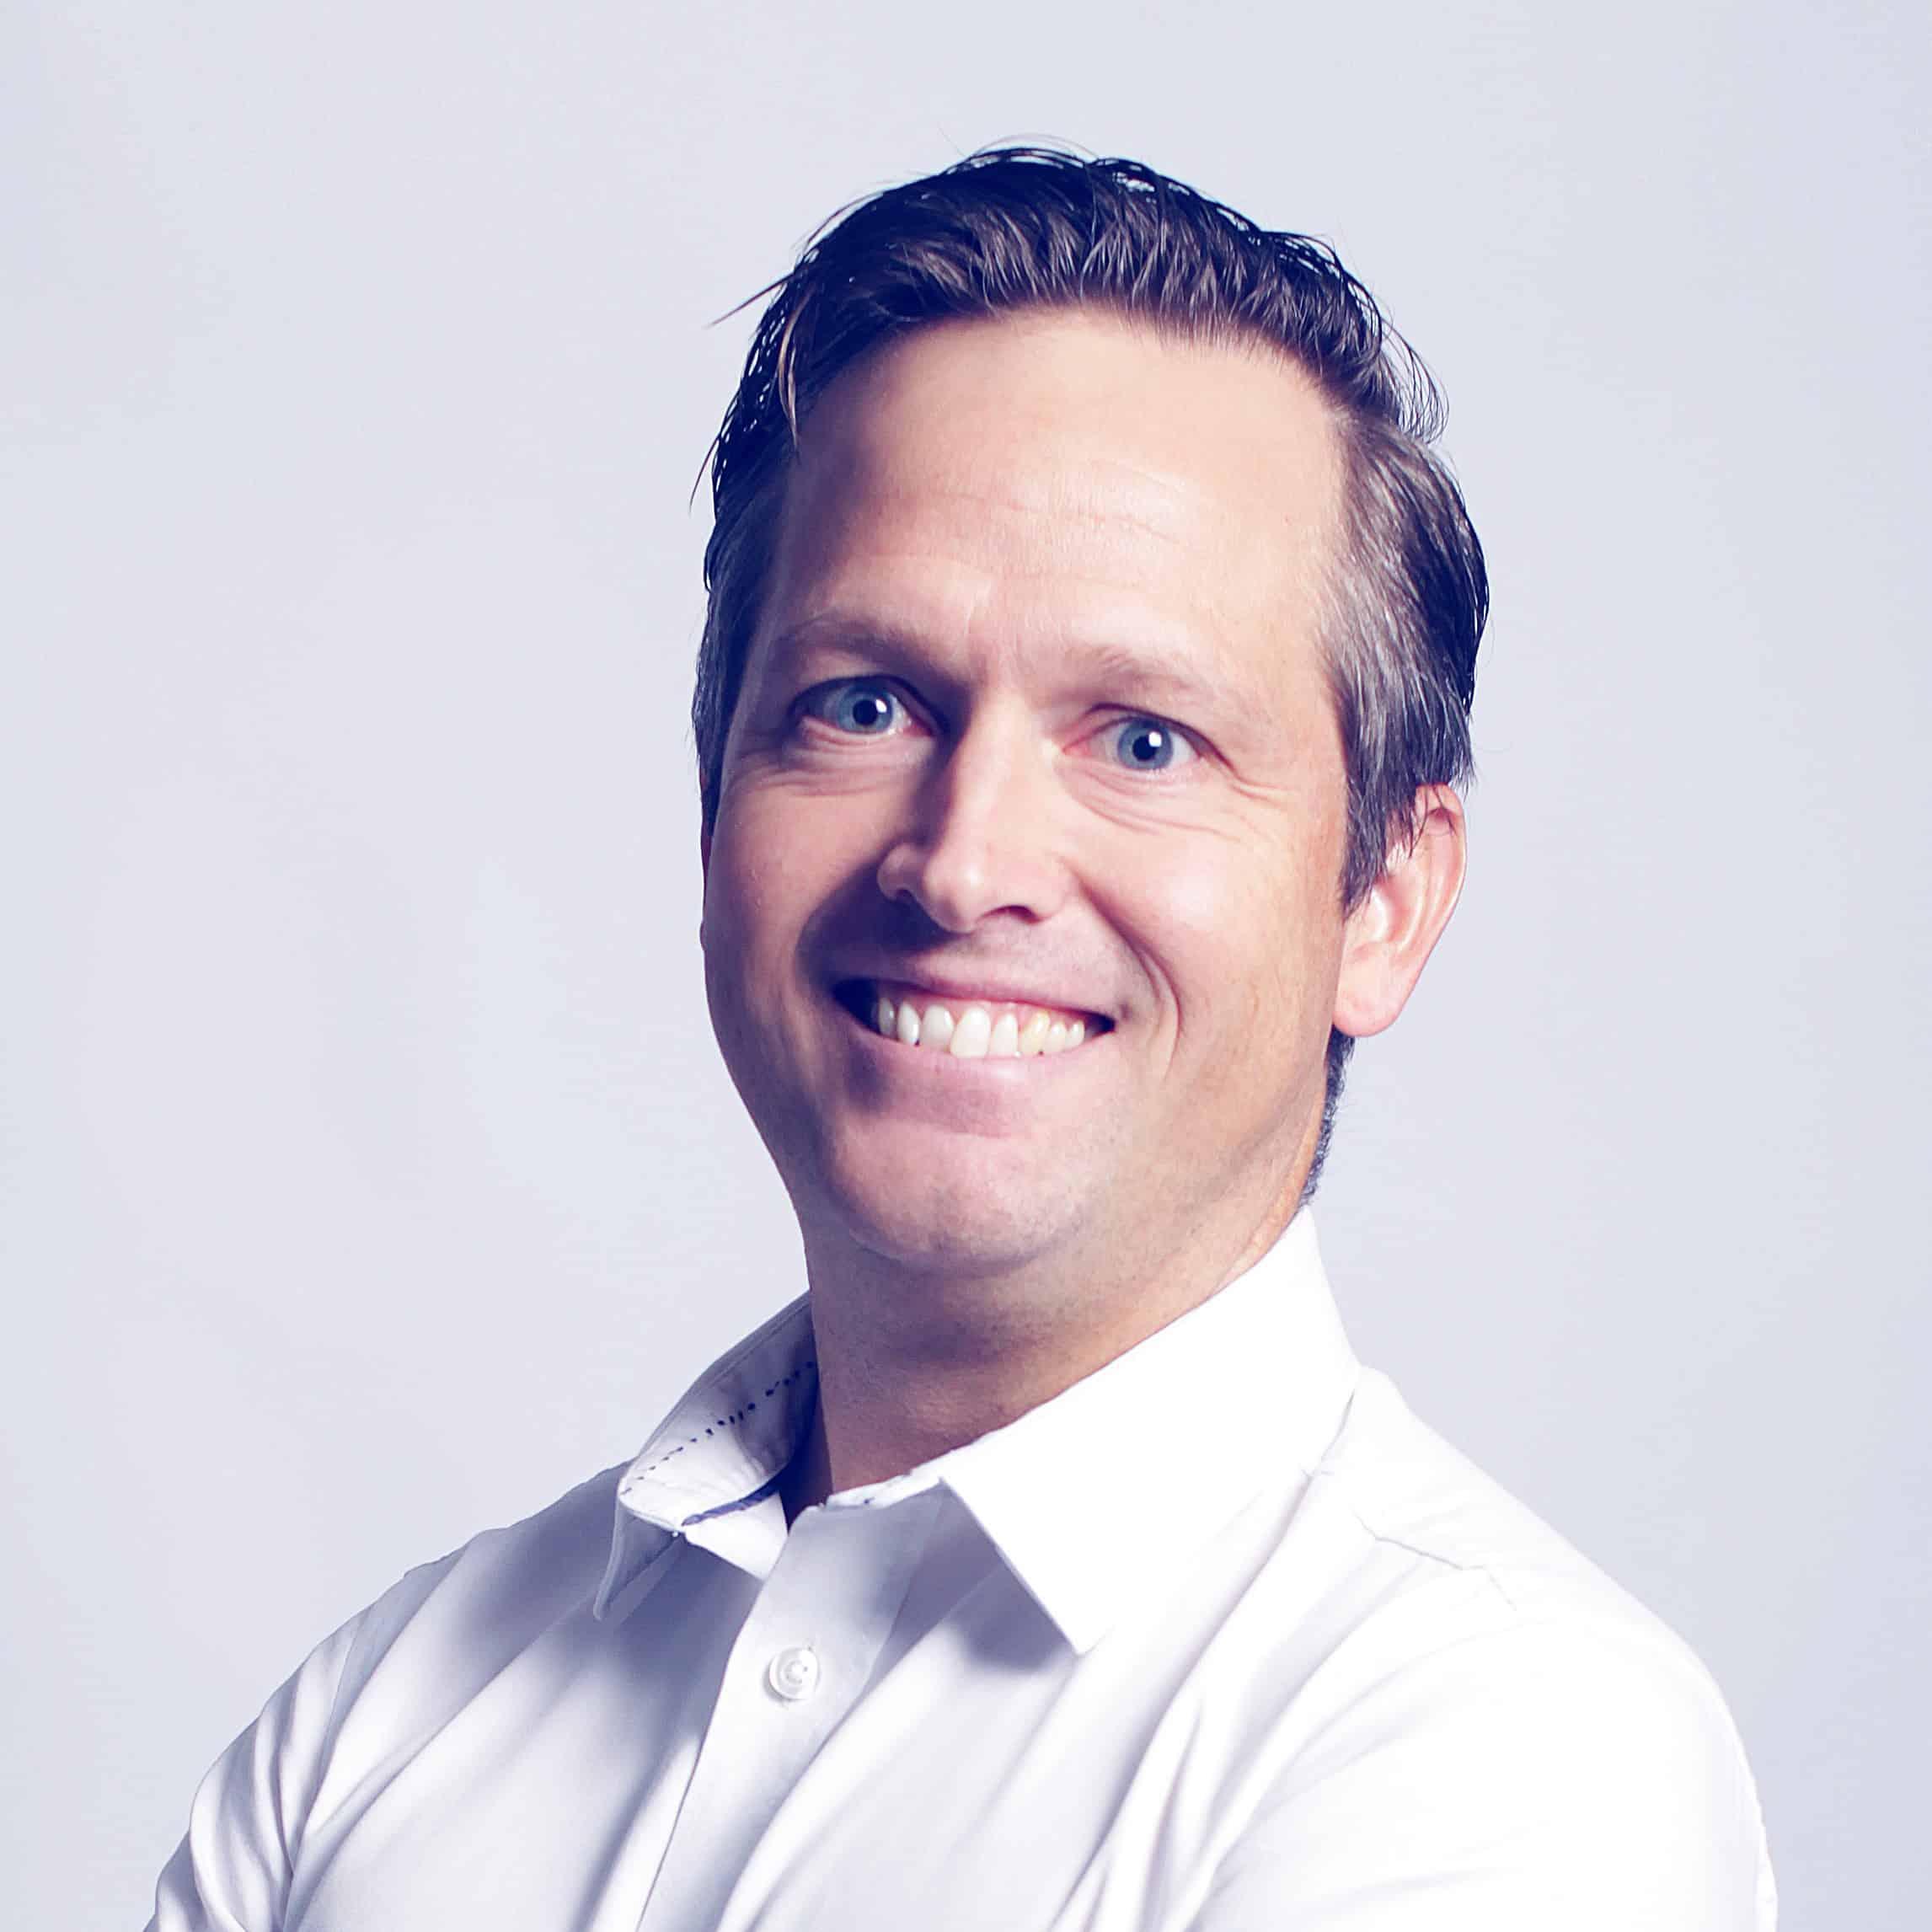 Fredrik Albing